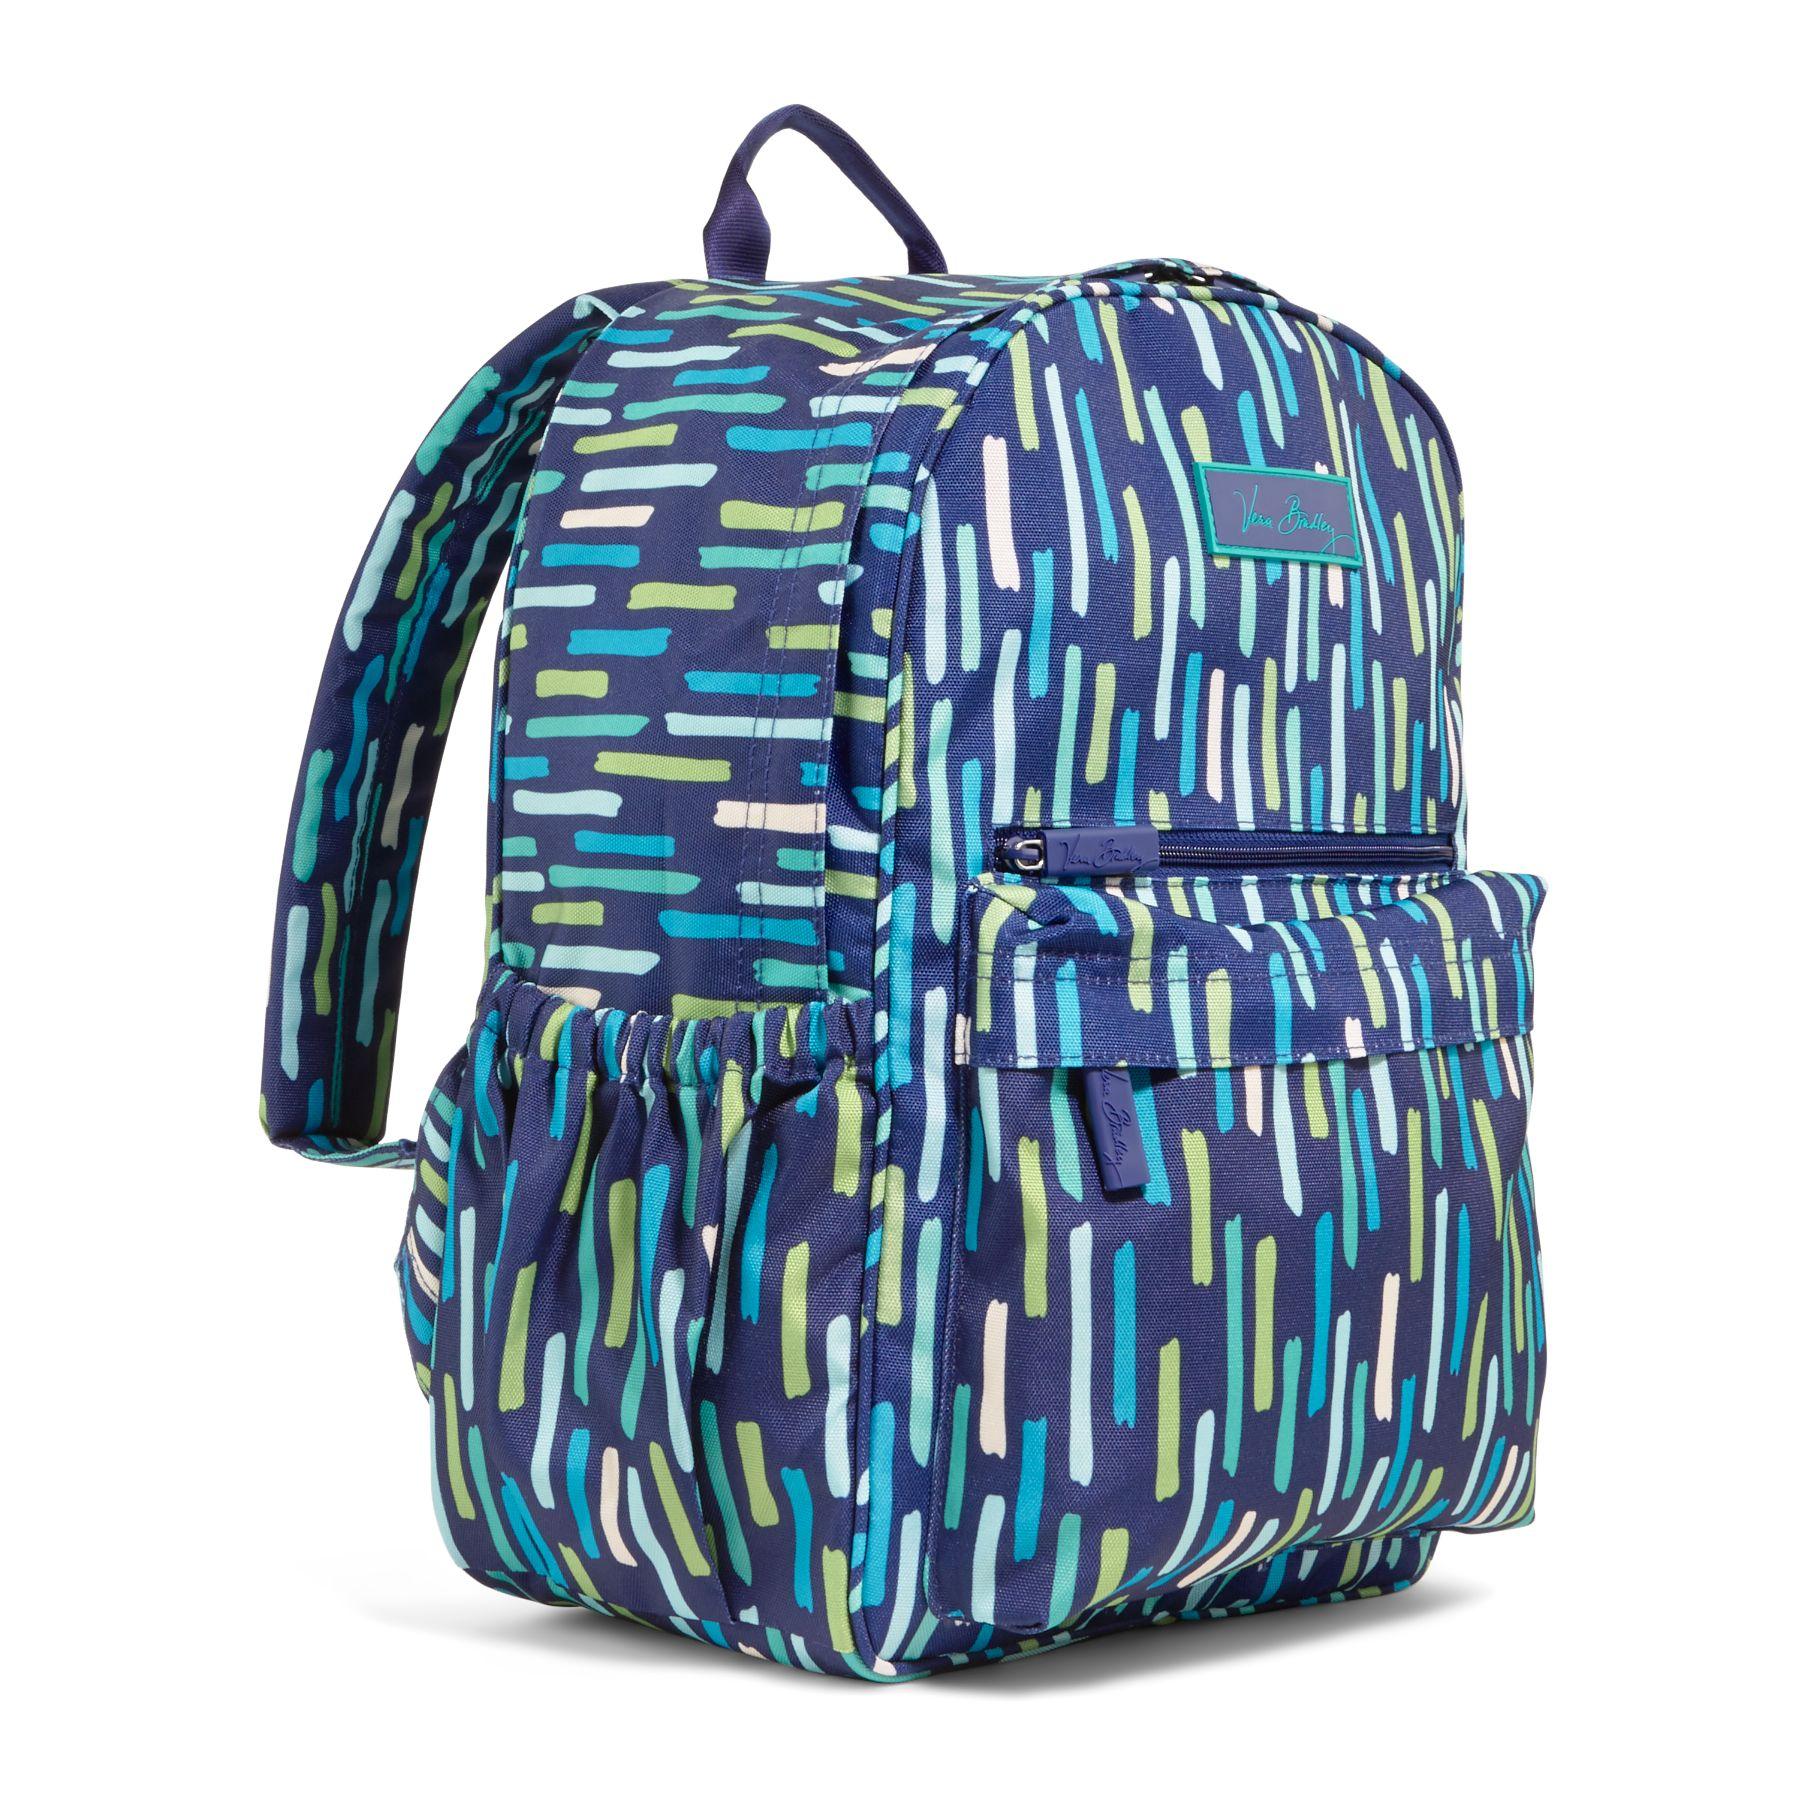 92609492d5 Vera-Bradley-Lighten-Up-Just-Right-Backpack-Bag thumbnail